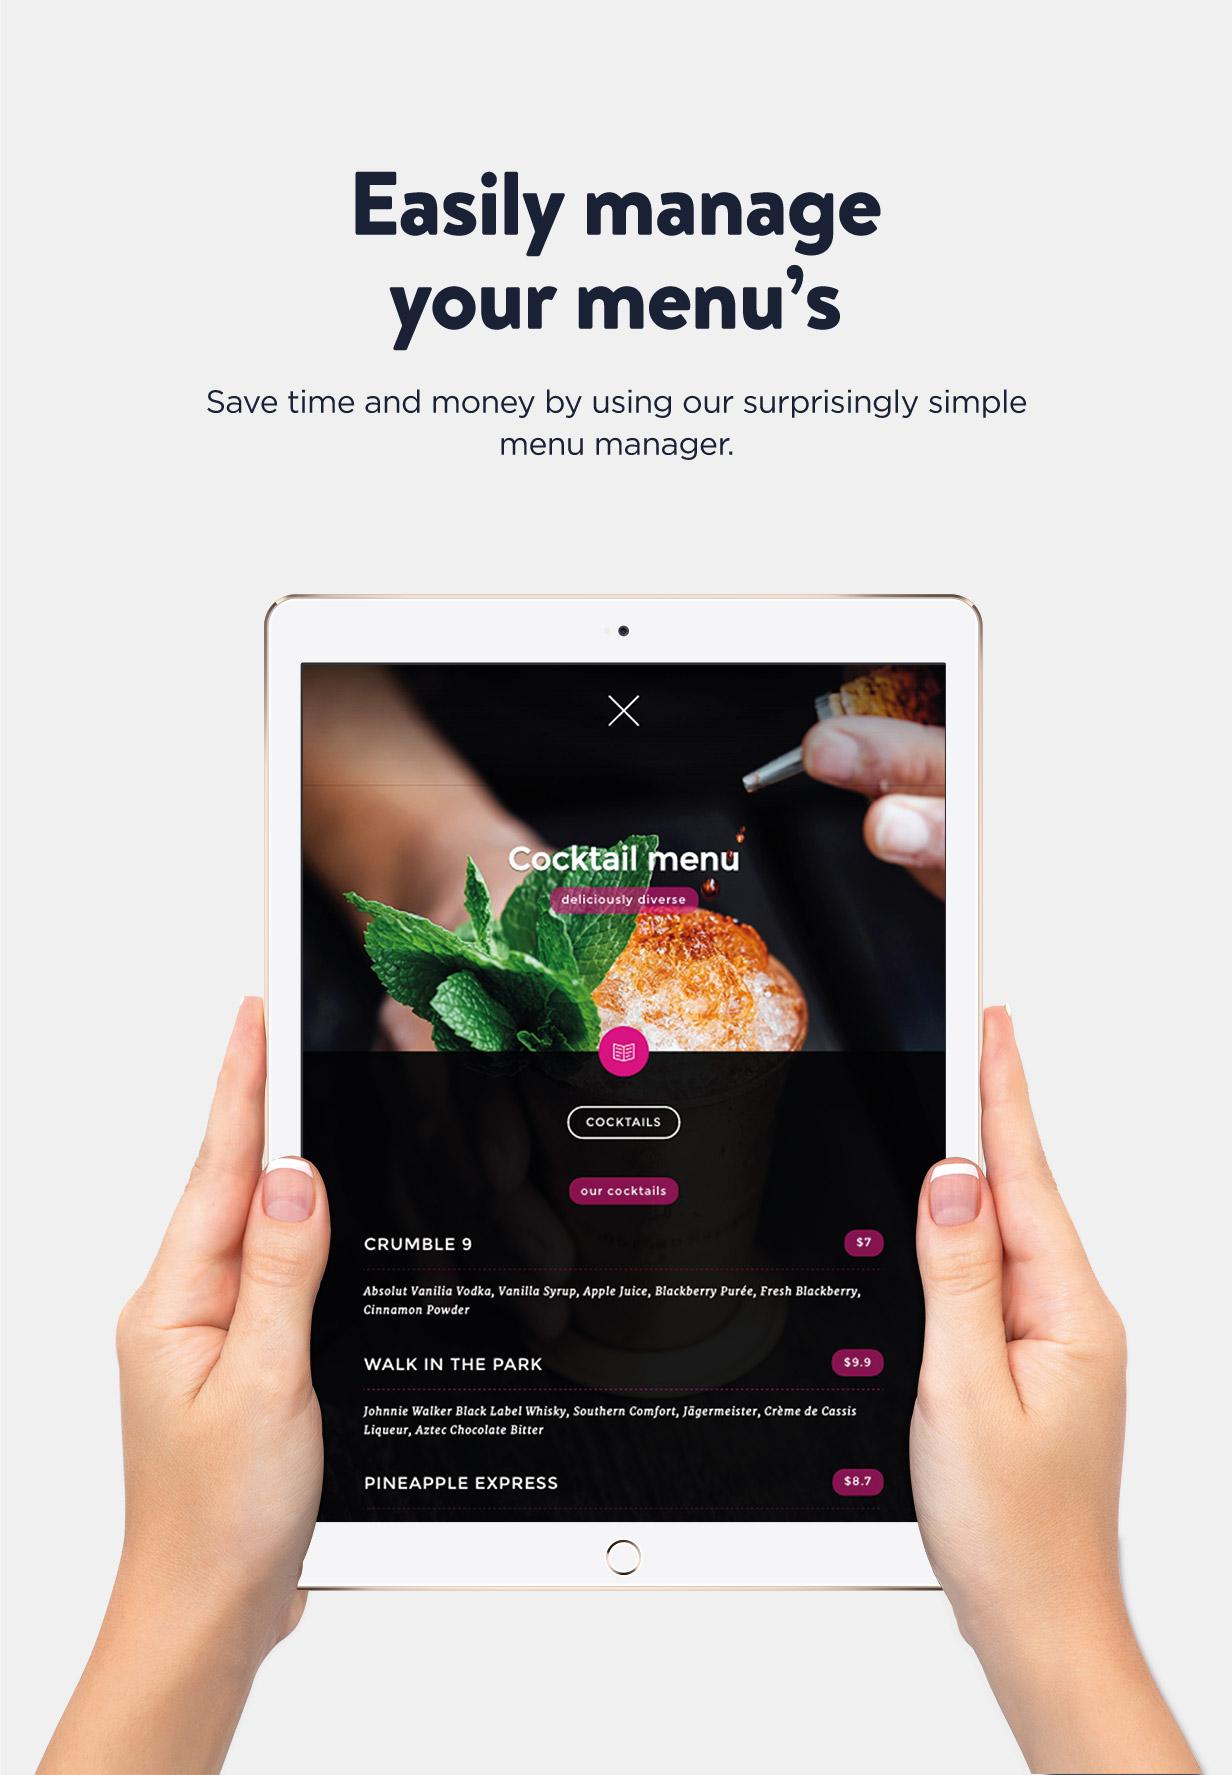 Ambiance Restaurant menu management Ambiance - Restaurant WordPress Theme Nulled Free Download Ambiance – Restaurant WordPress Theme Nulled Free Download 5